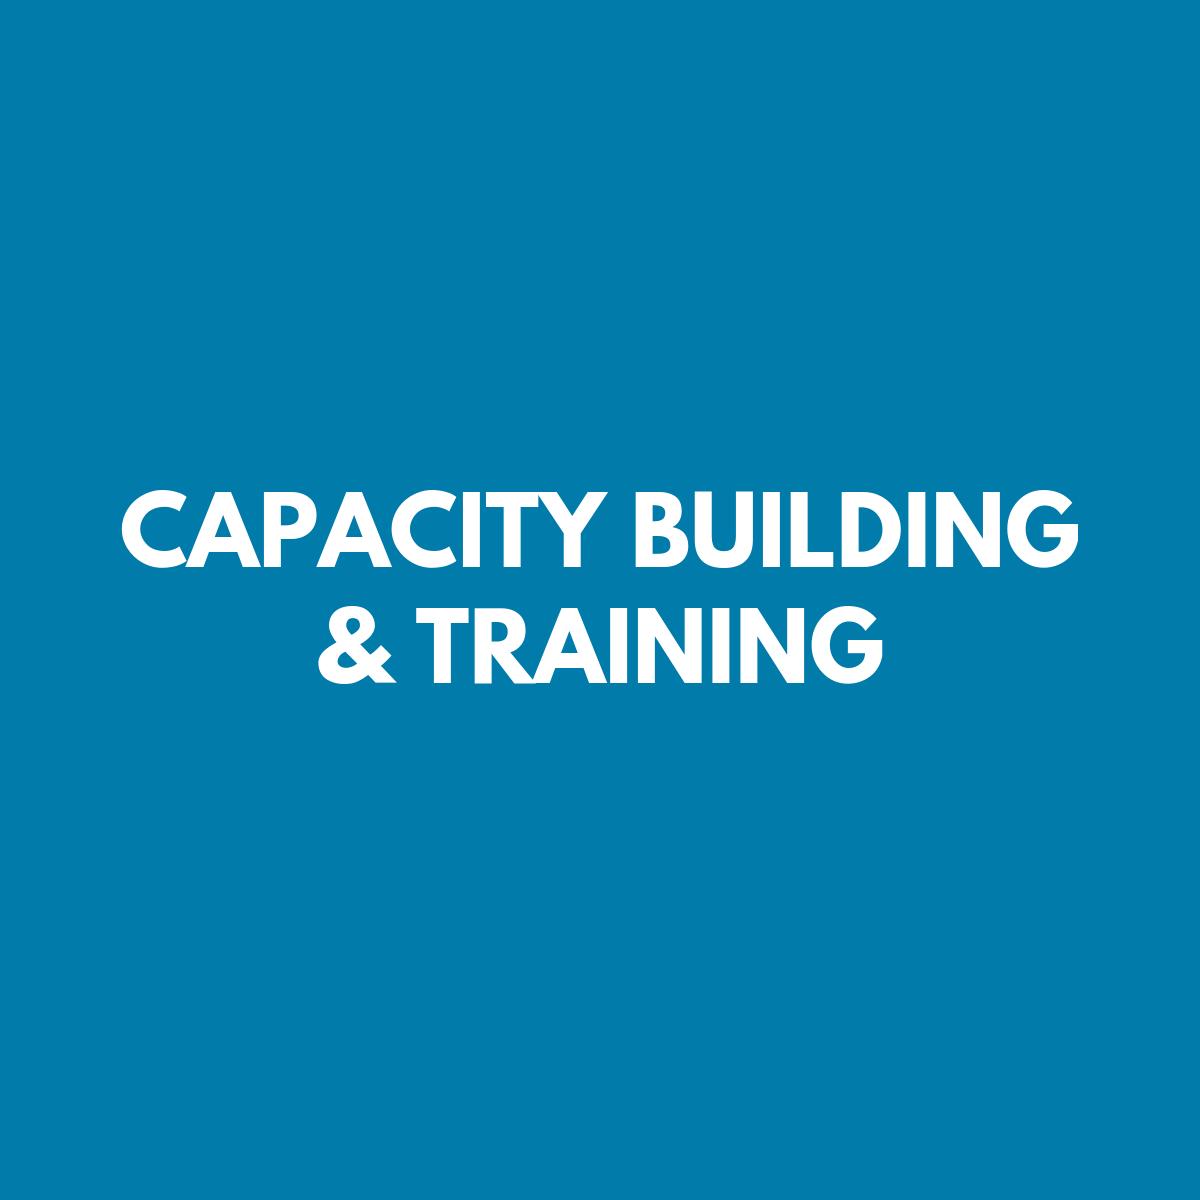 Capacity Building & Training